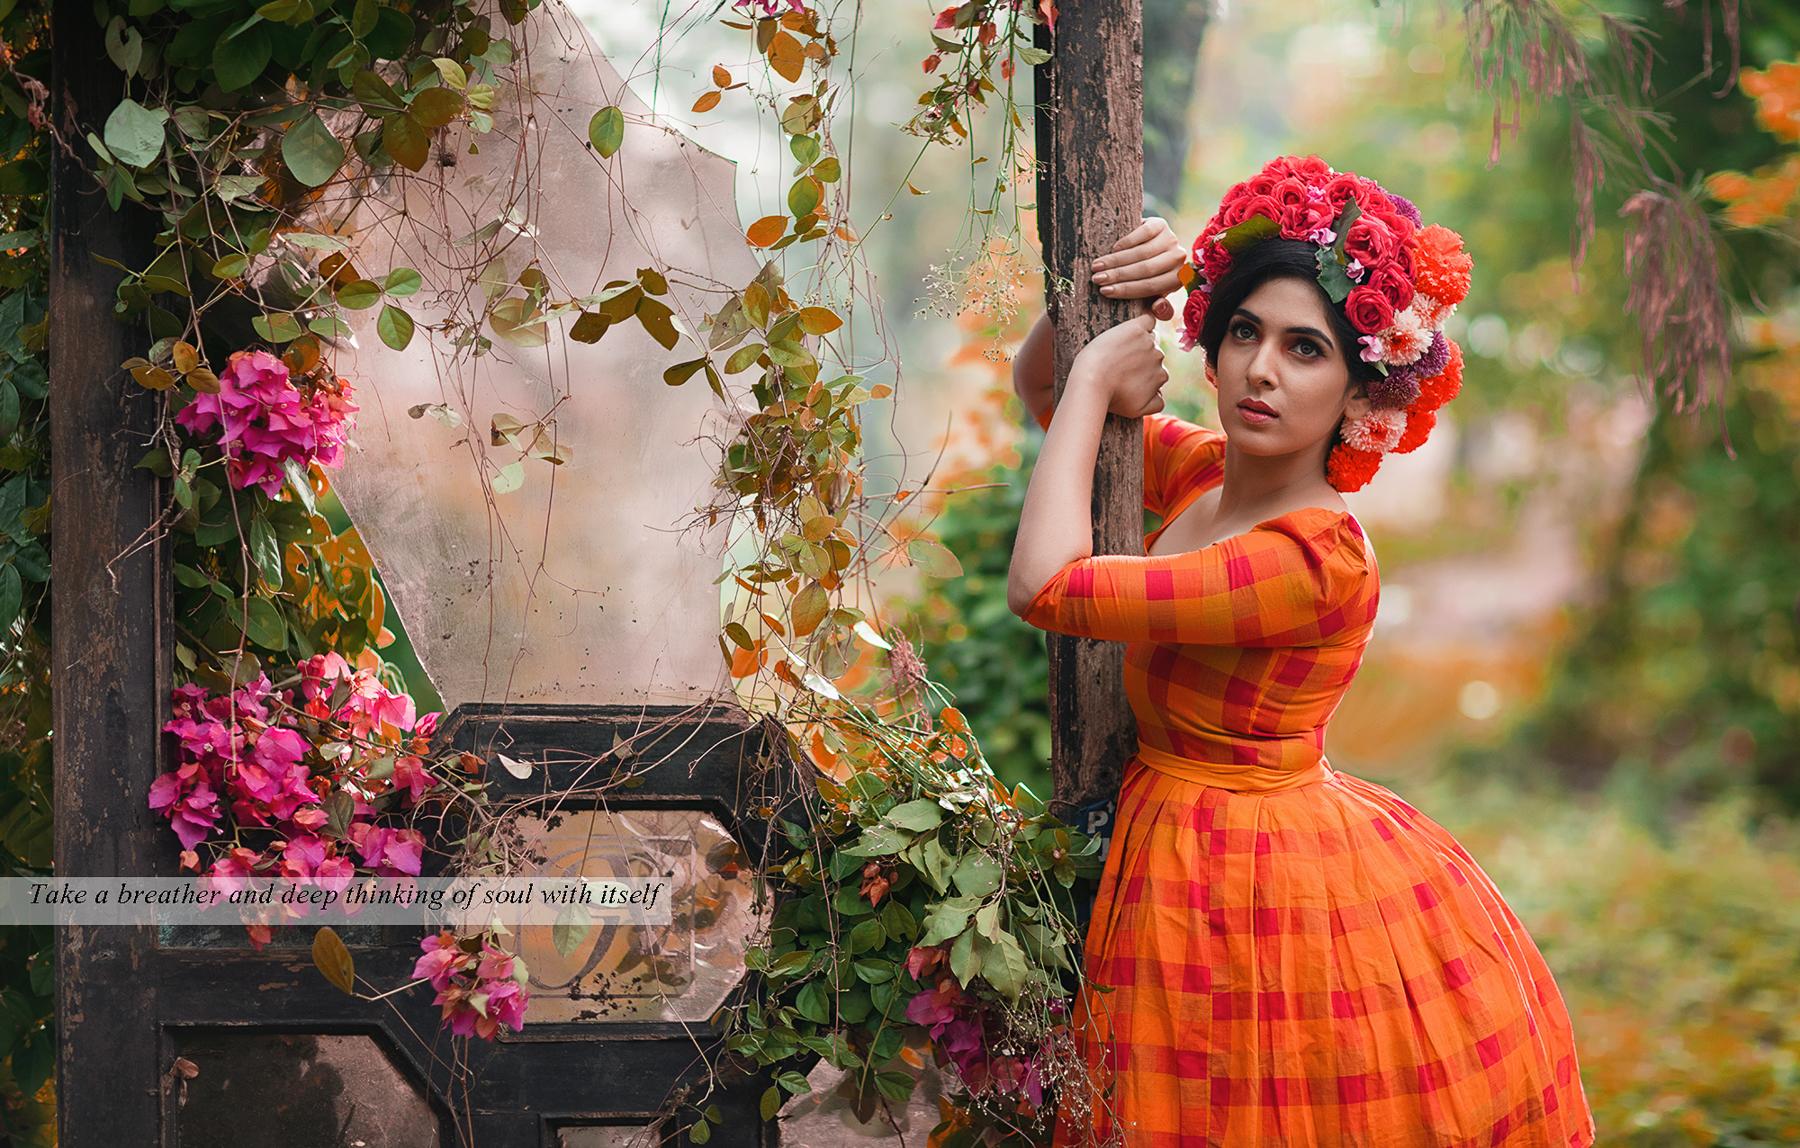 Bhagathkumar Bhagavathi Leilani The Heavenly Flower